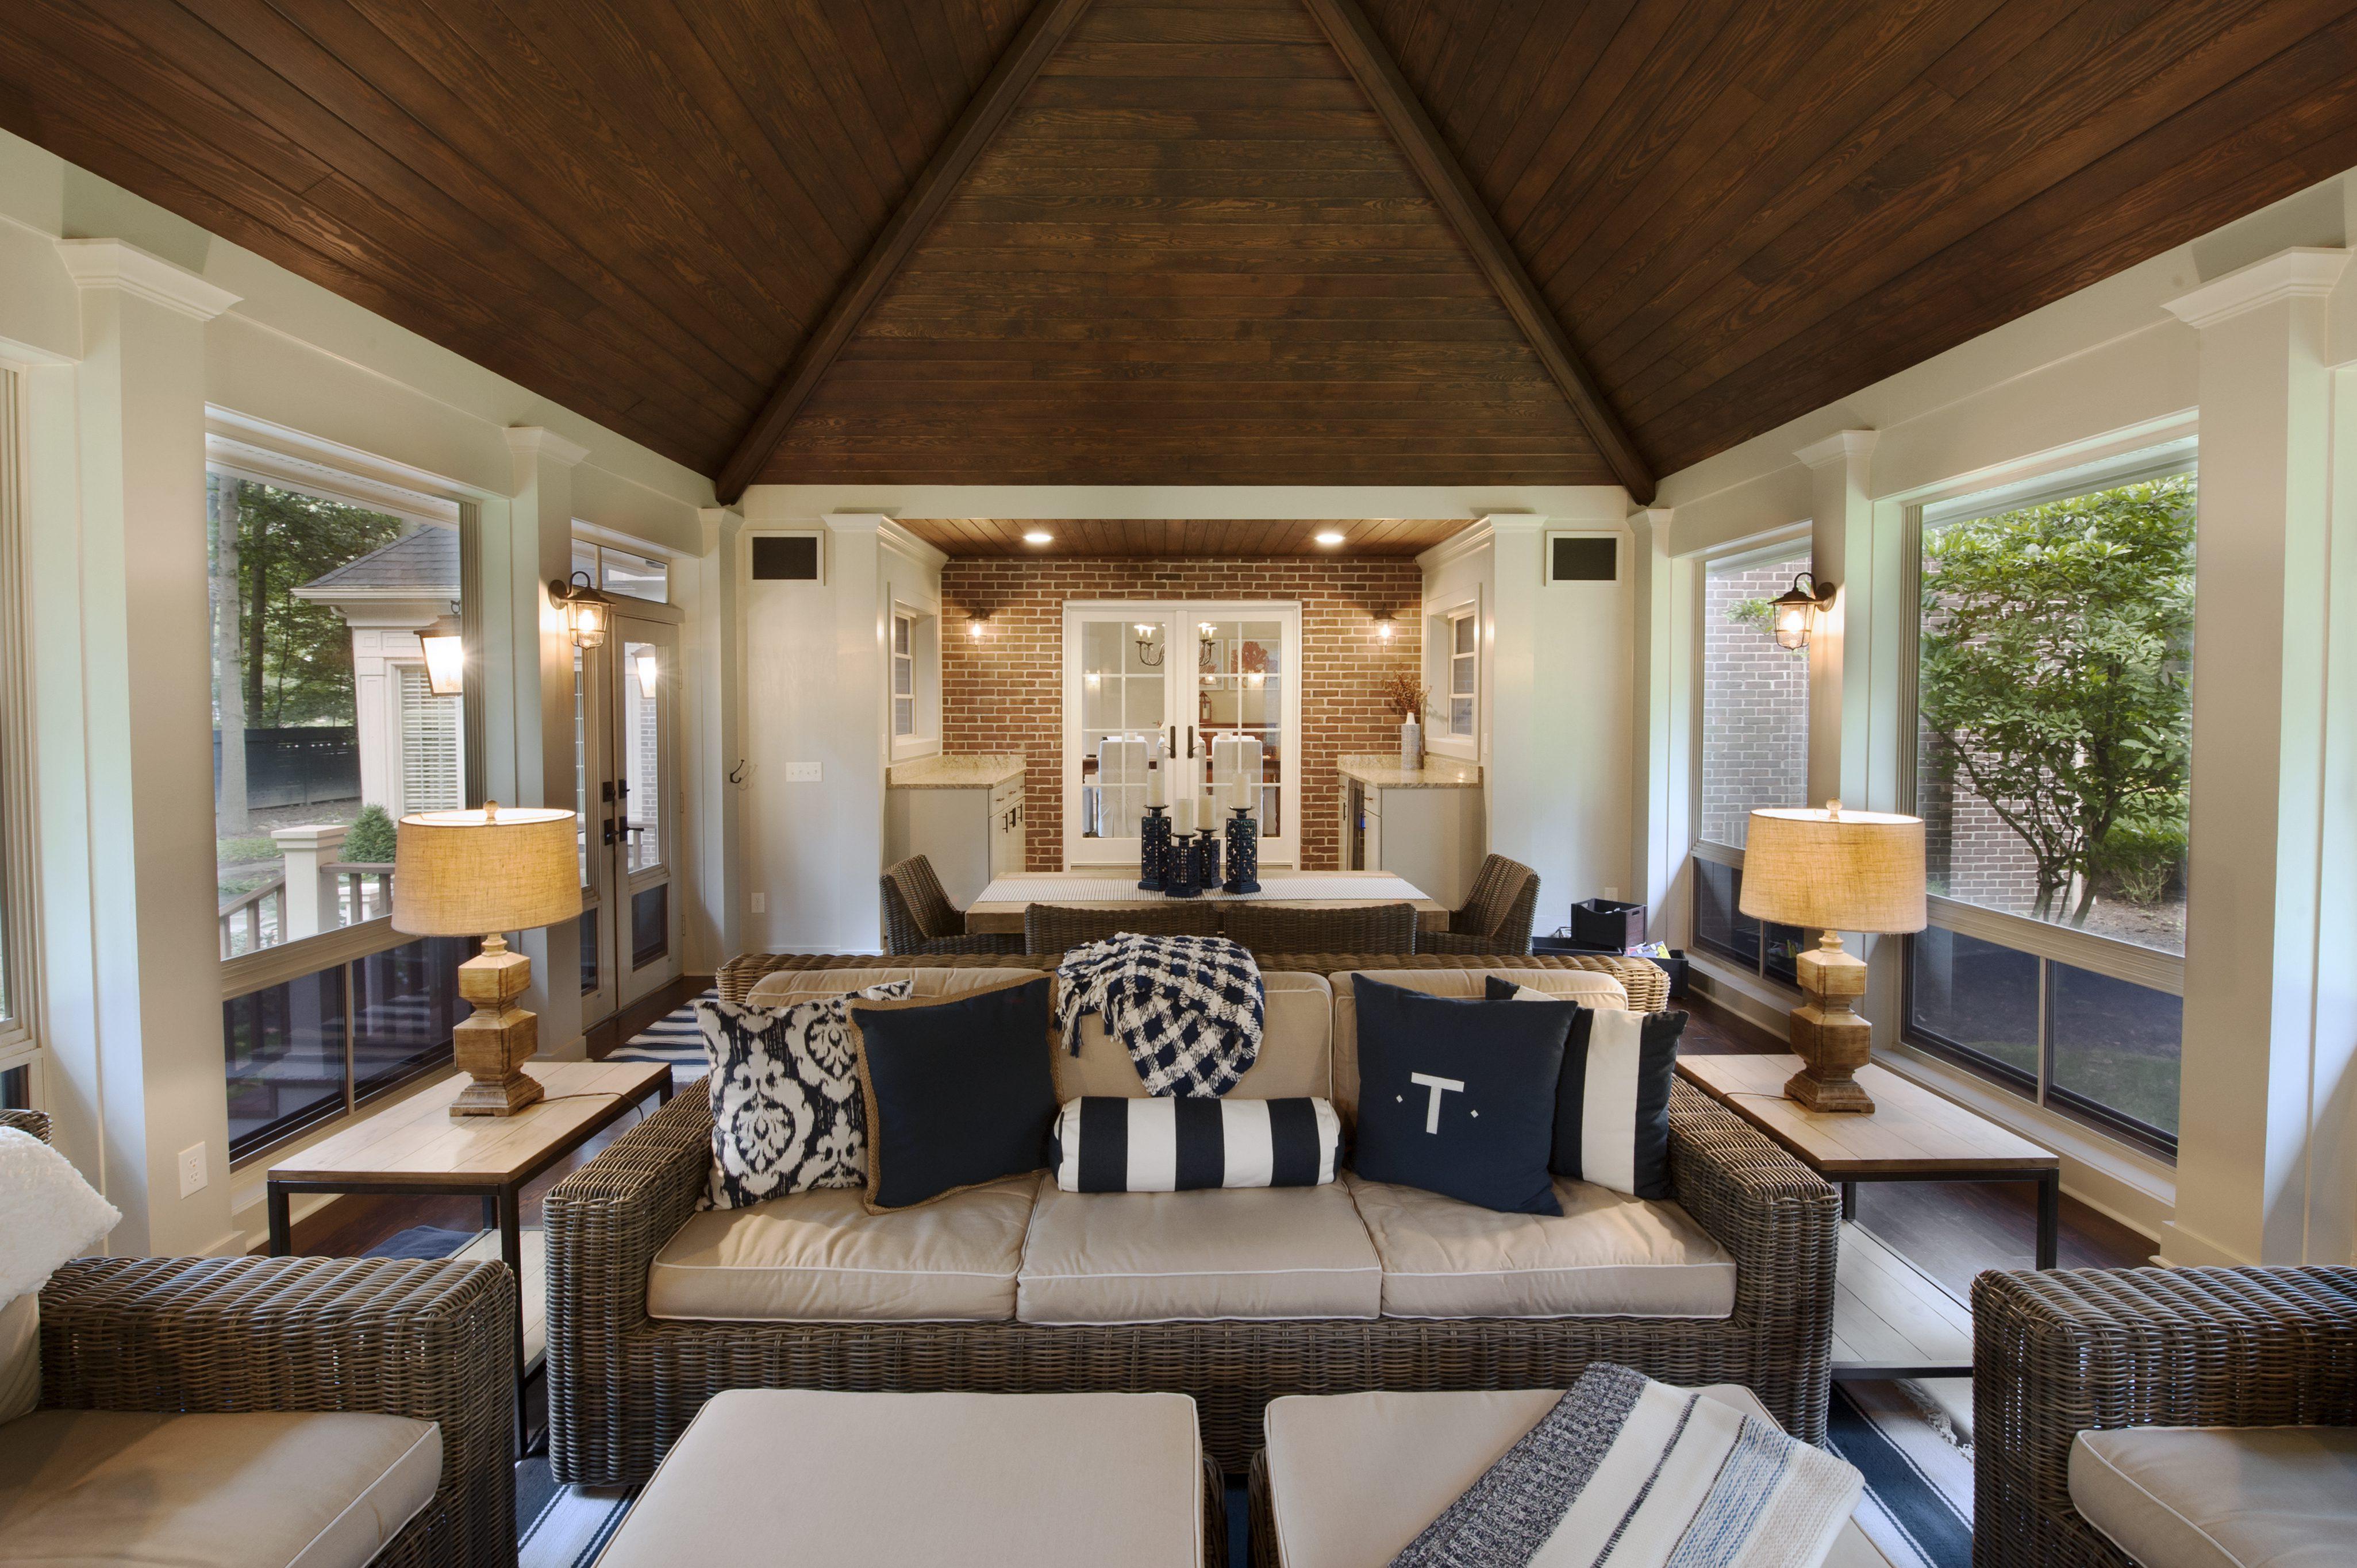 10 Home Renovation Ideas for Better Living